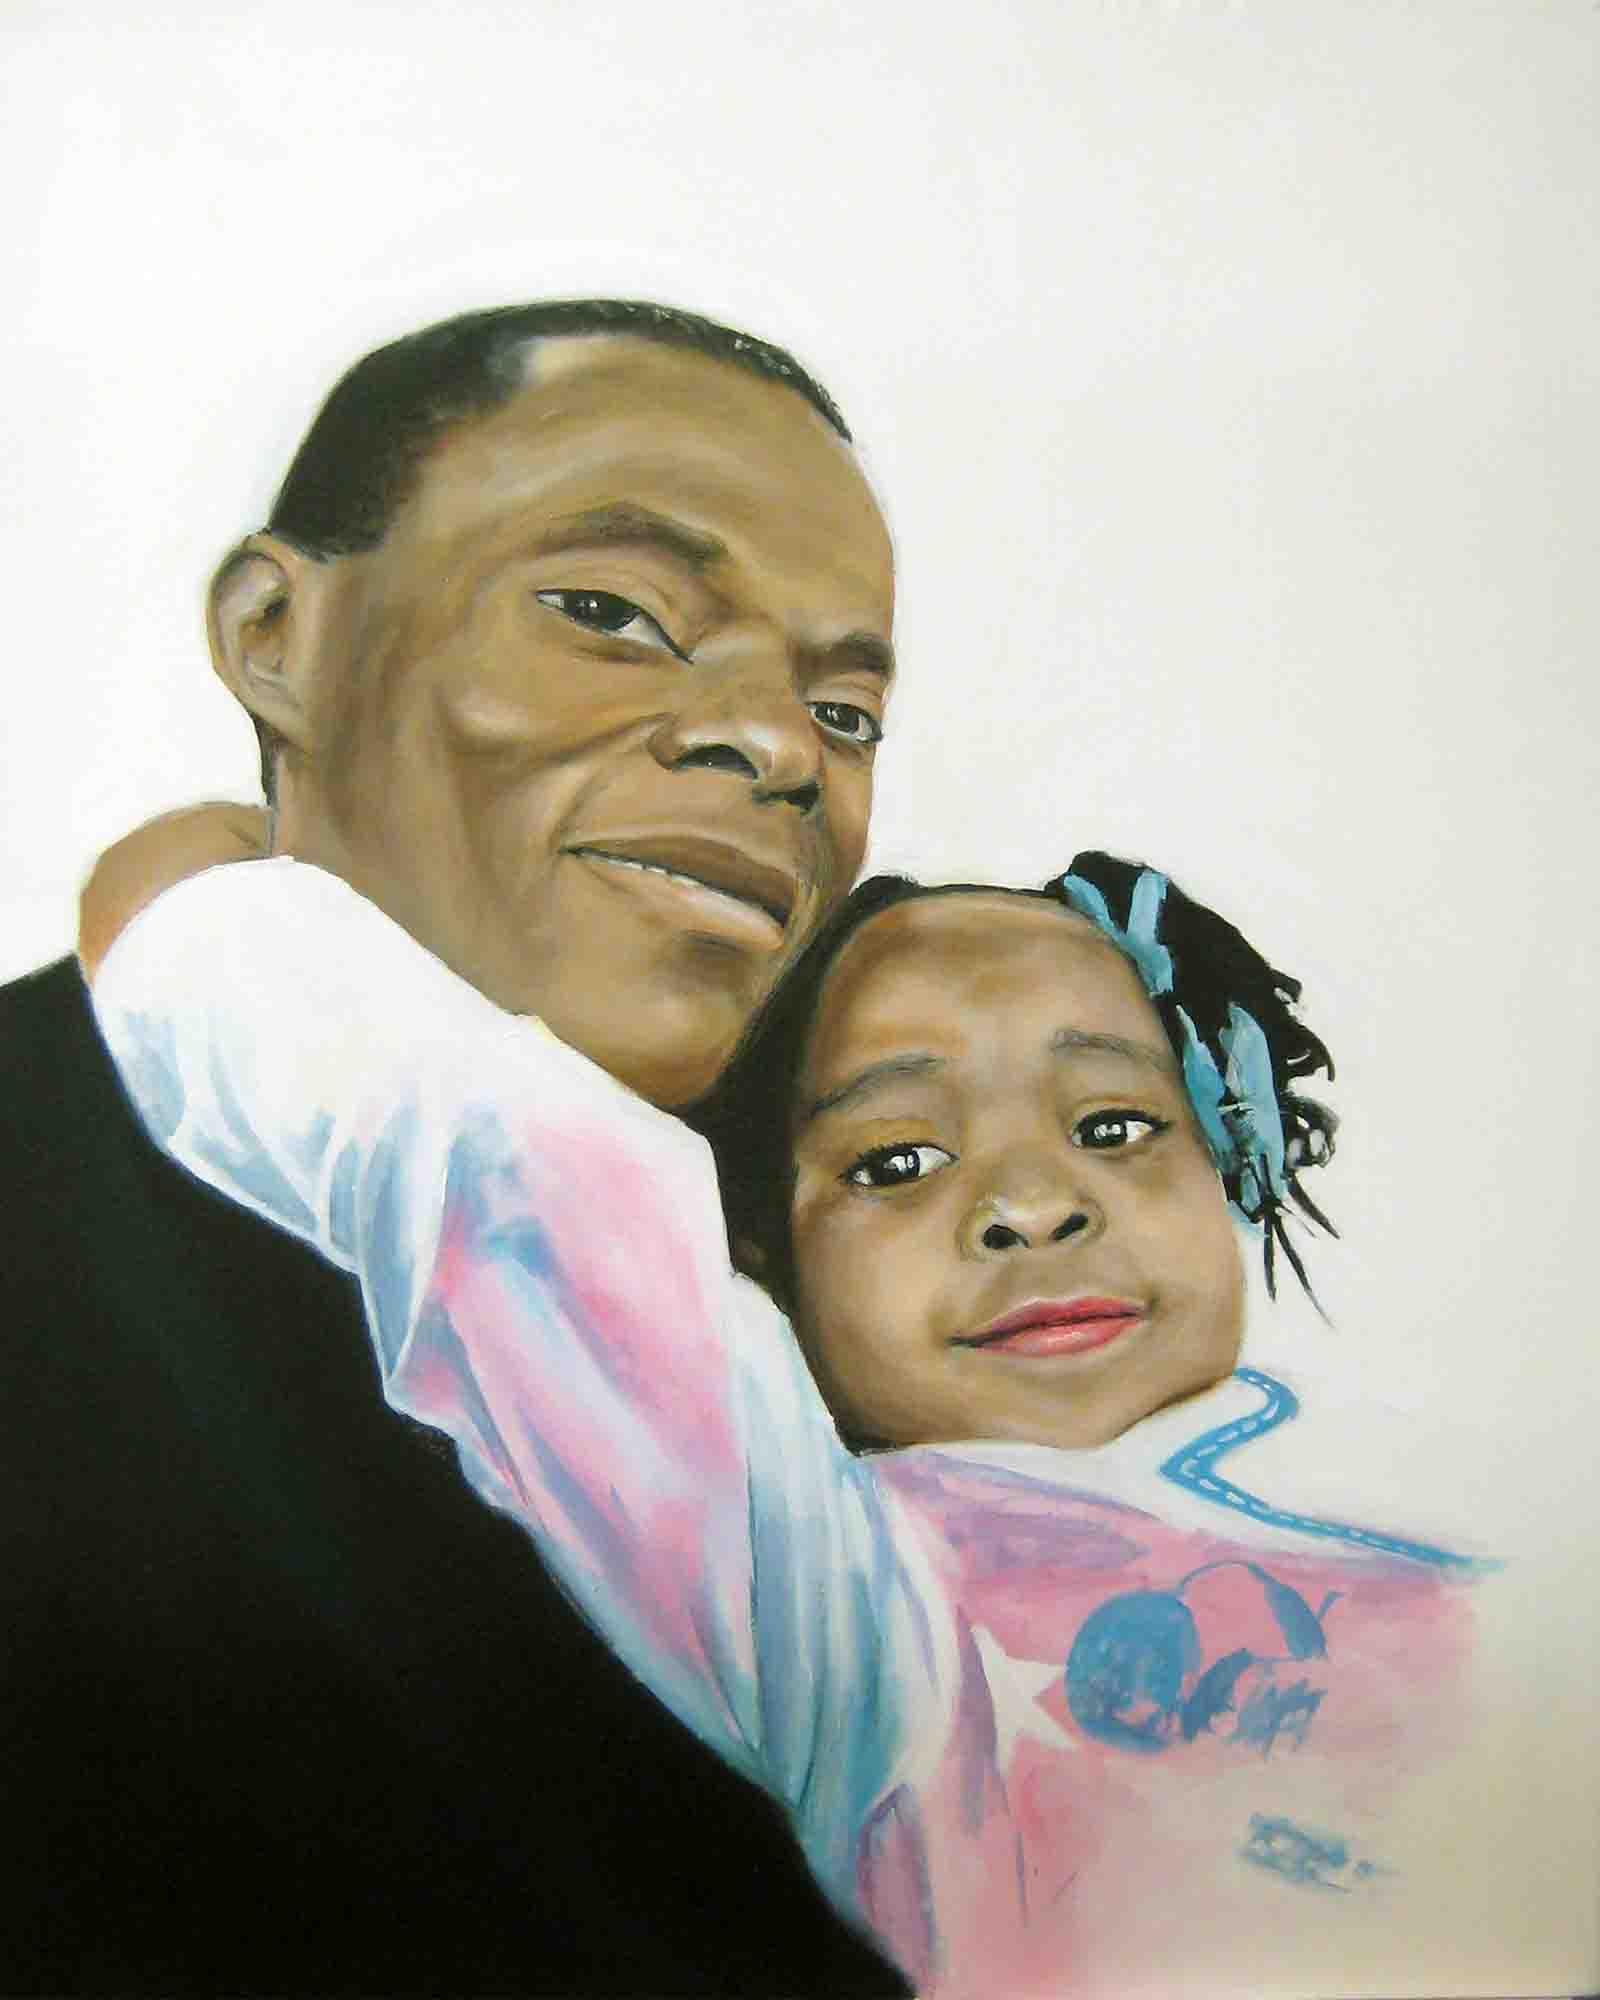 Innocent & his daughter